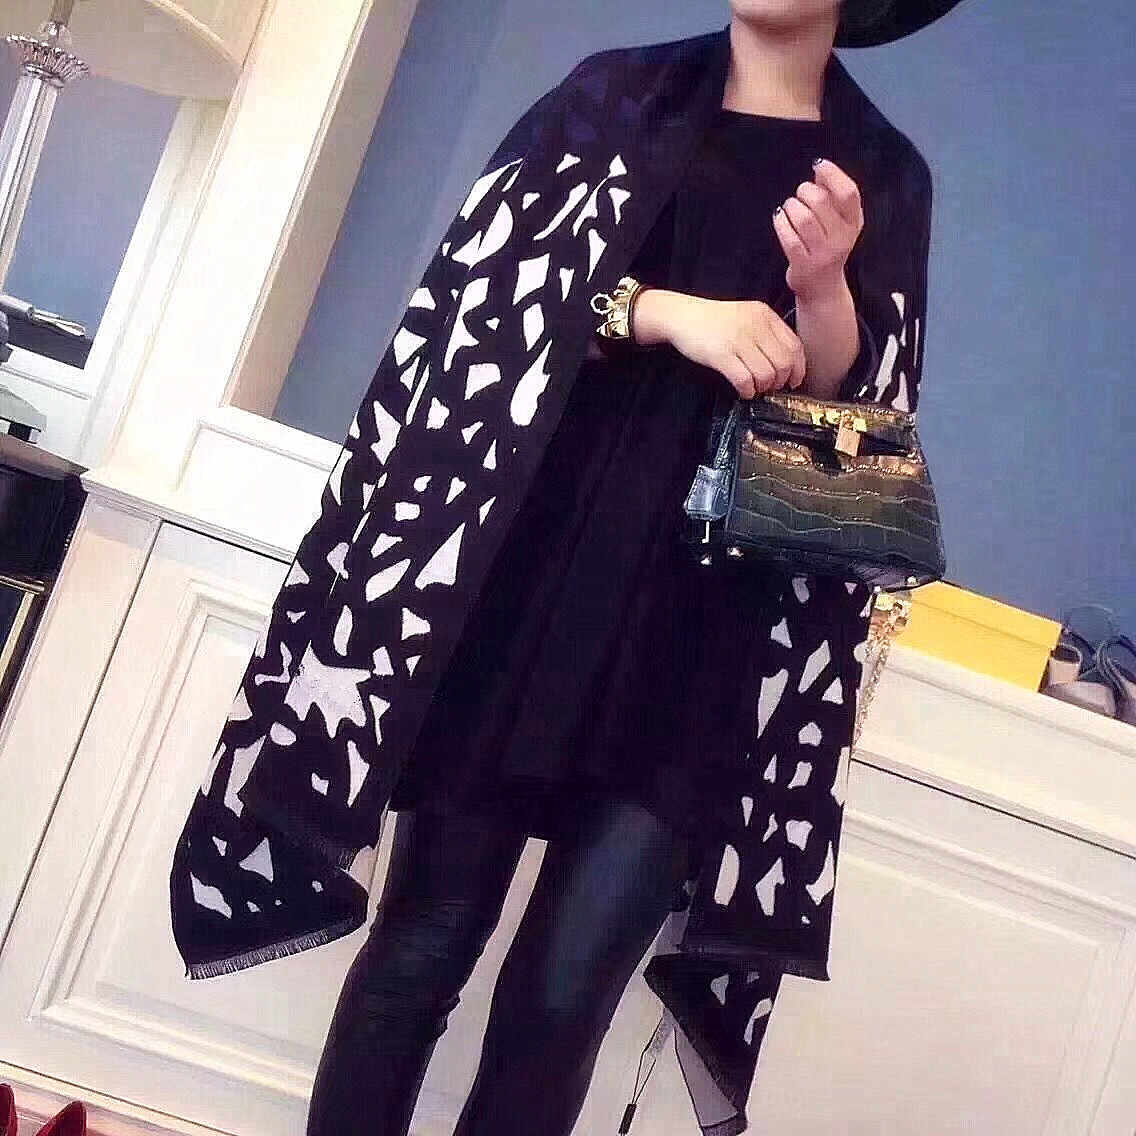 180 x 70 cm Winter Brand Luxury Oversize Scarves Simple Fashion Warm Blanket  Wrap Cashmere Scarf bde2a4507eb